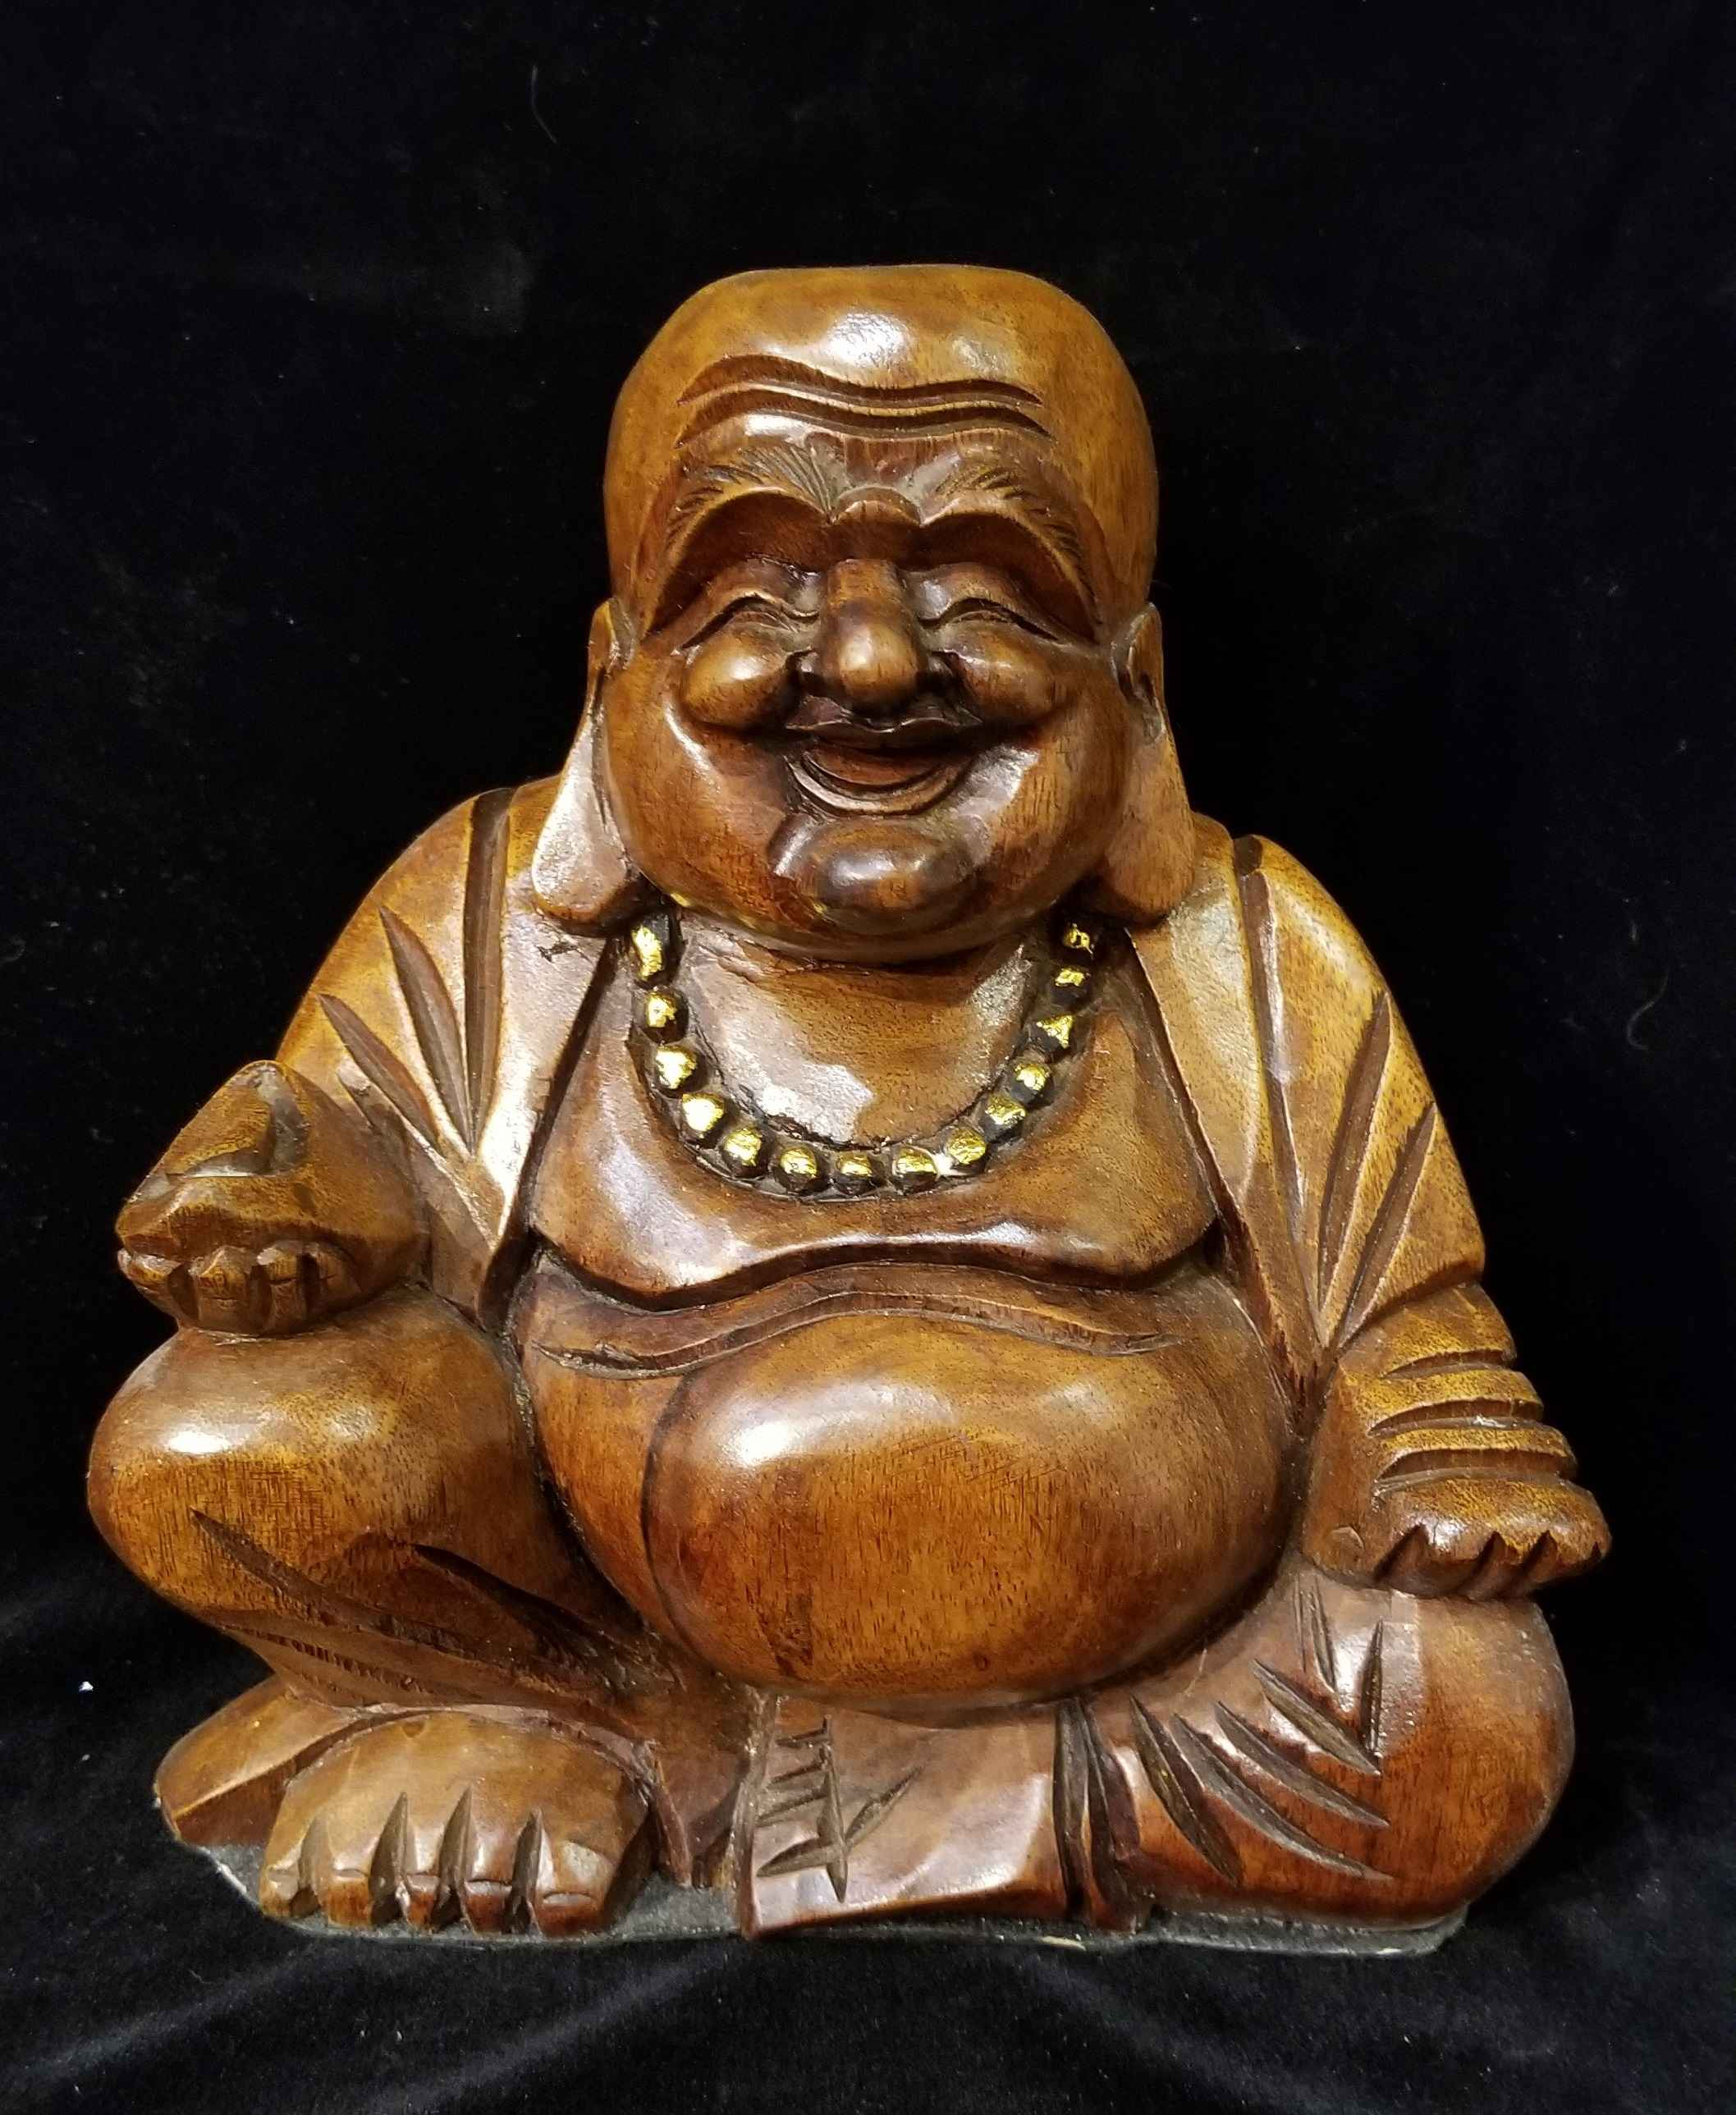 Buddha Sculpture by  Gallery Pieces - Masterpiece Online